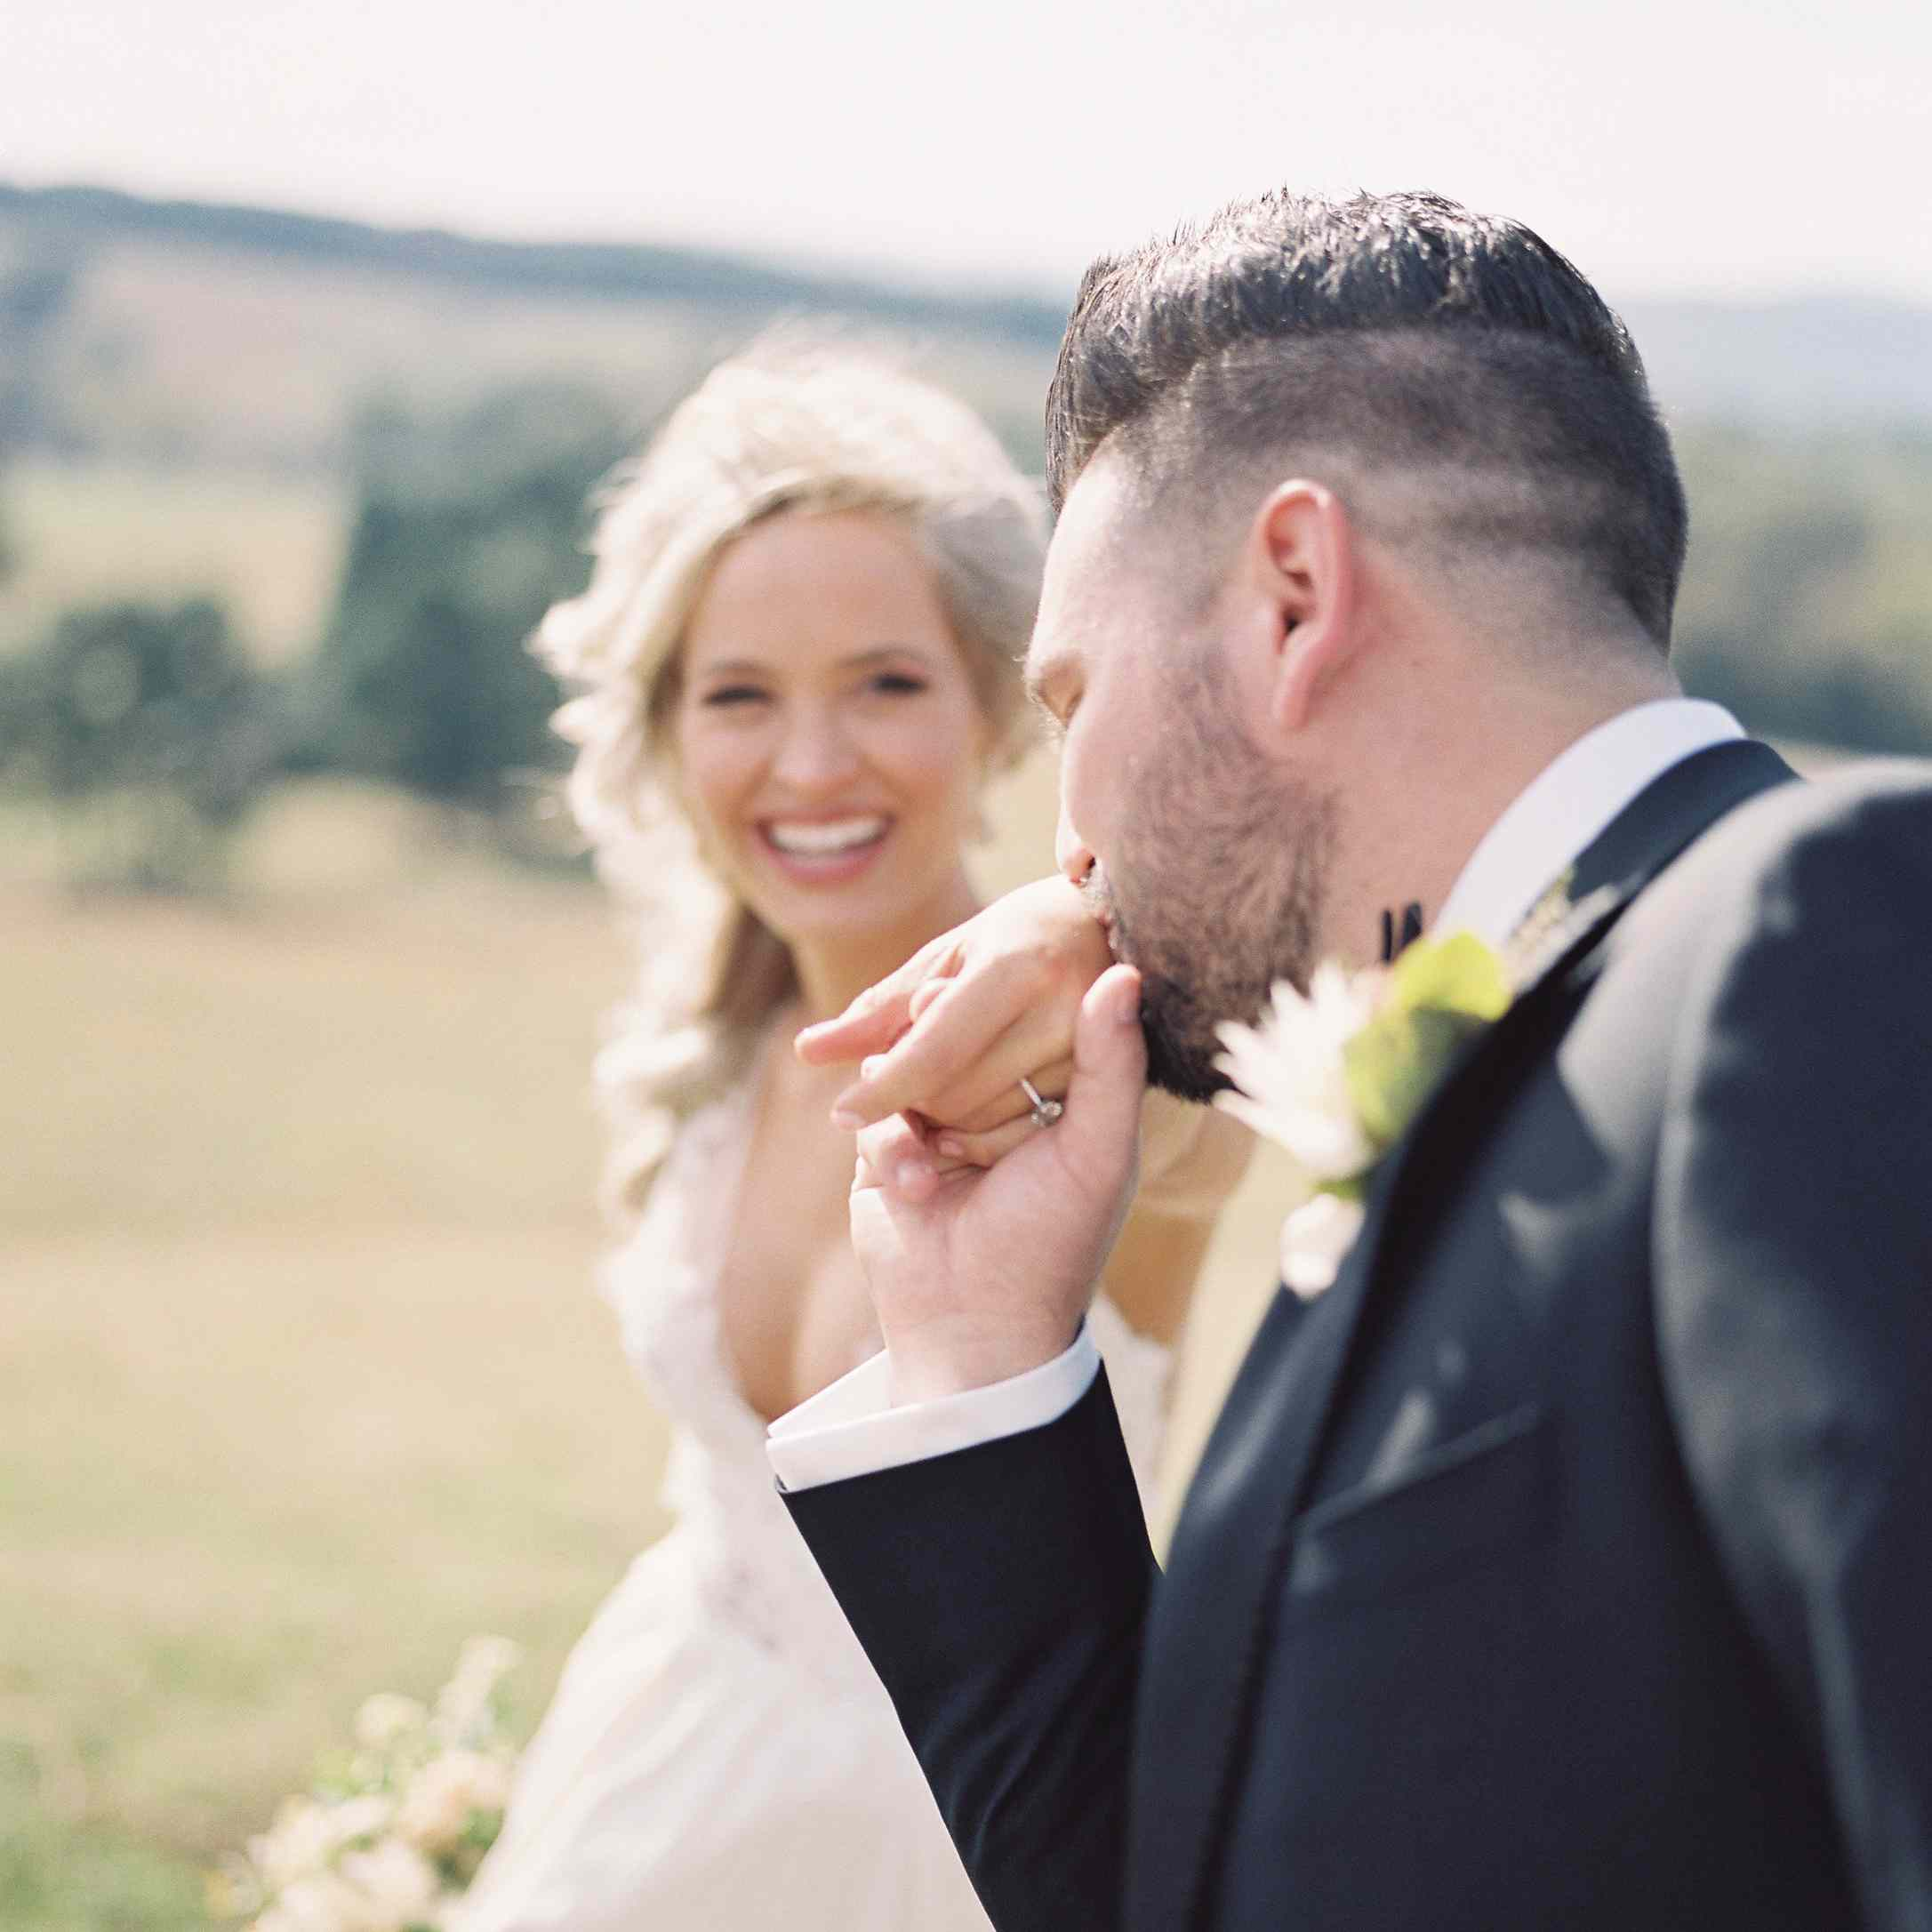 <p>Groom kissing brides hand</p><br><br>